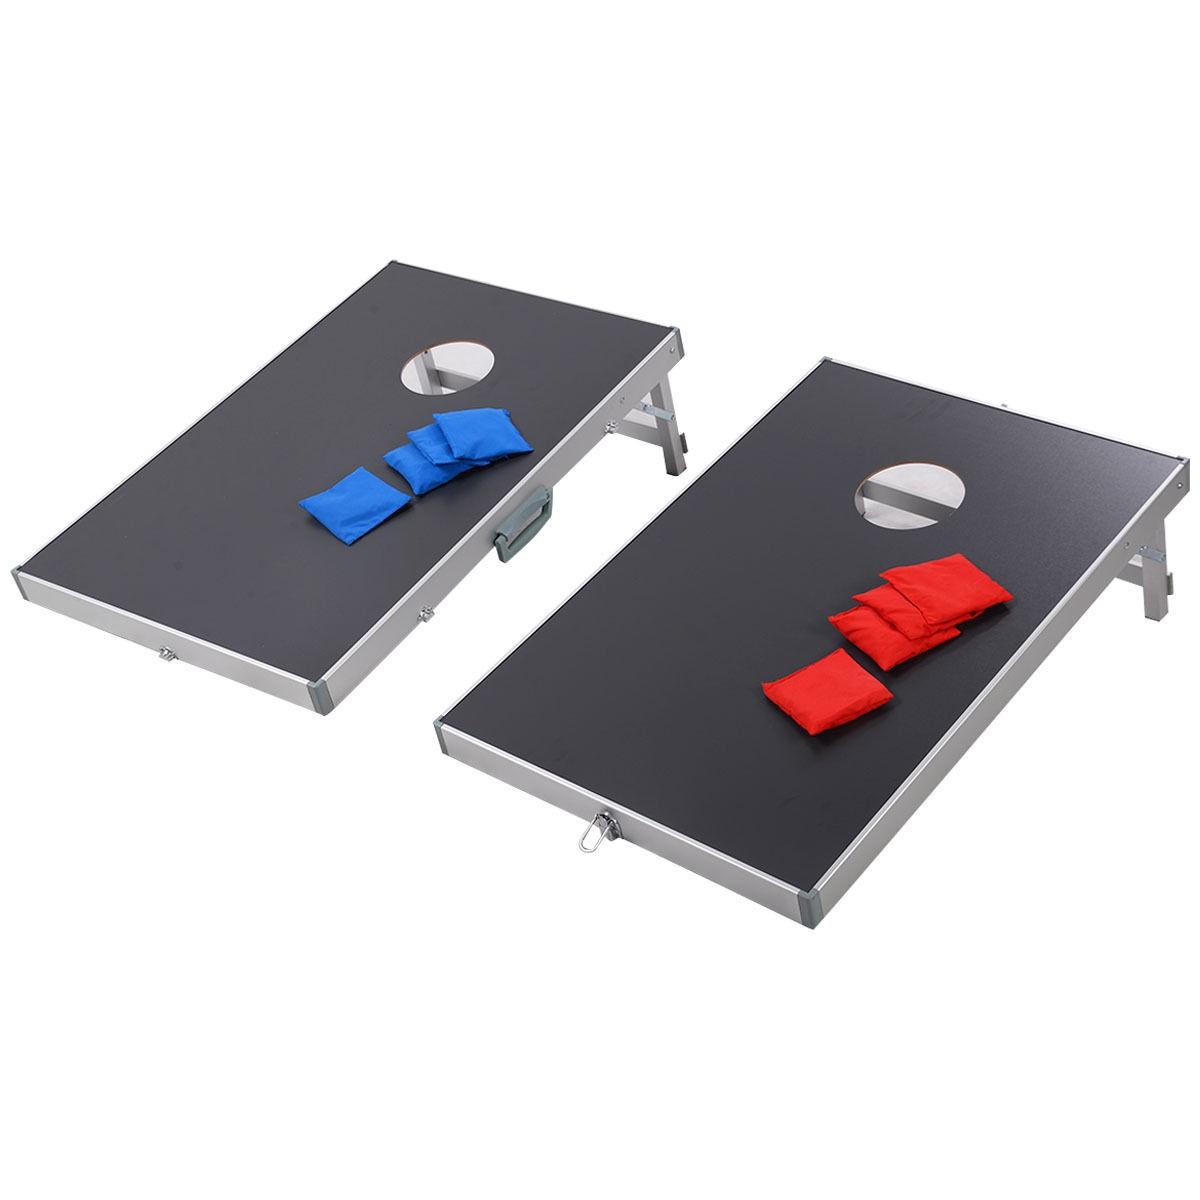 Foldable Bean Bag Toss Cornhole Game Set Boards Tailgate